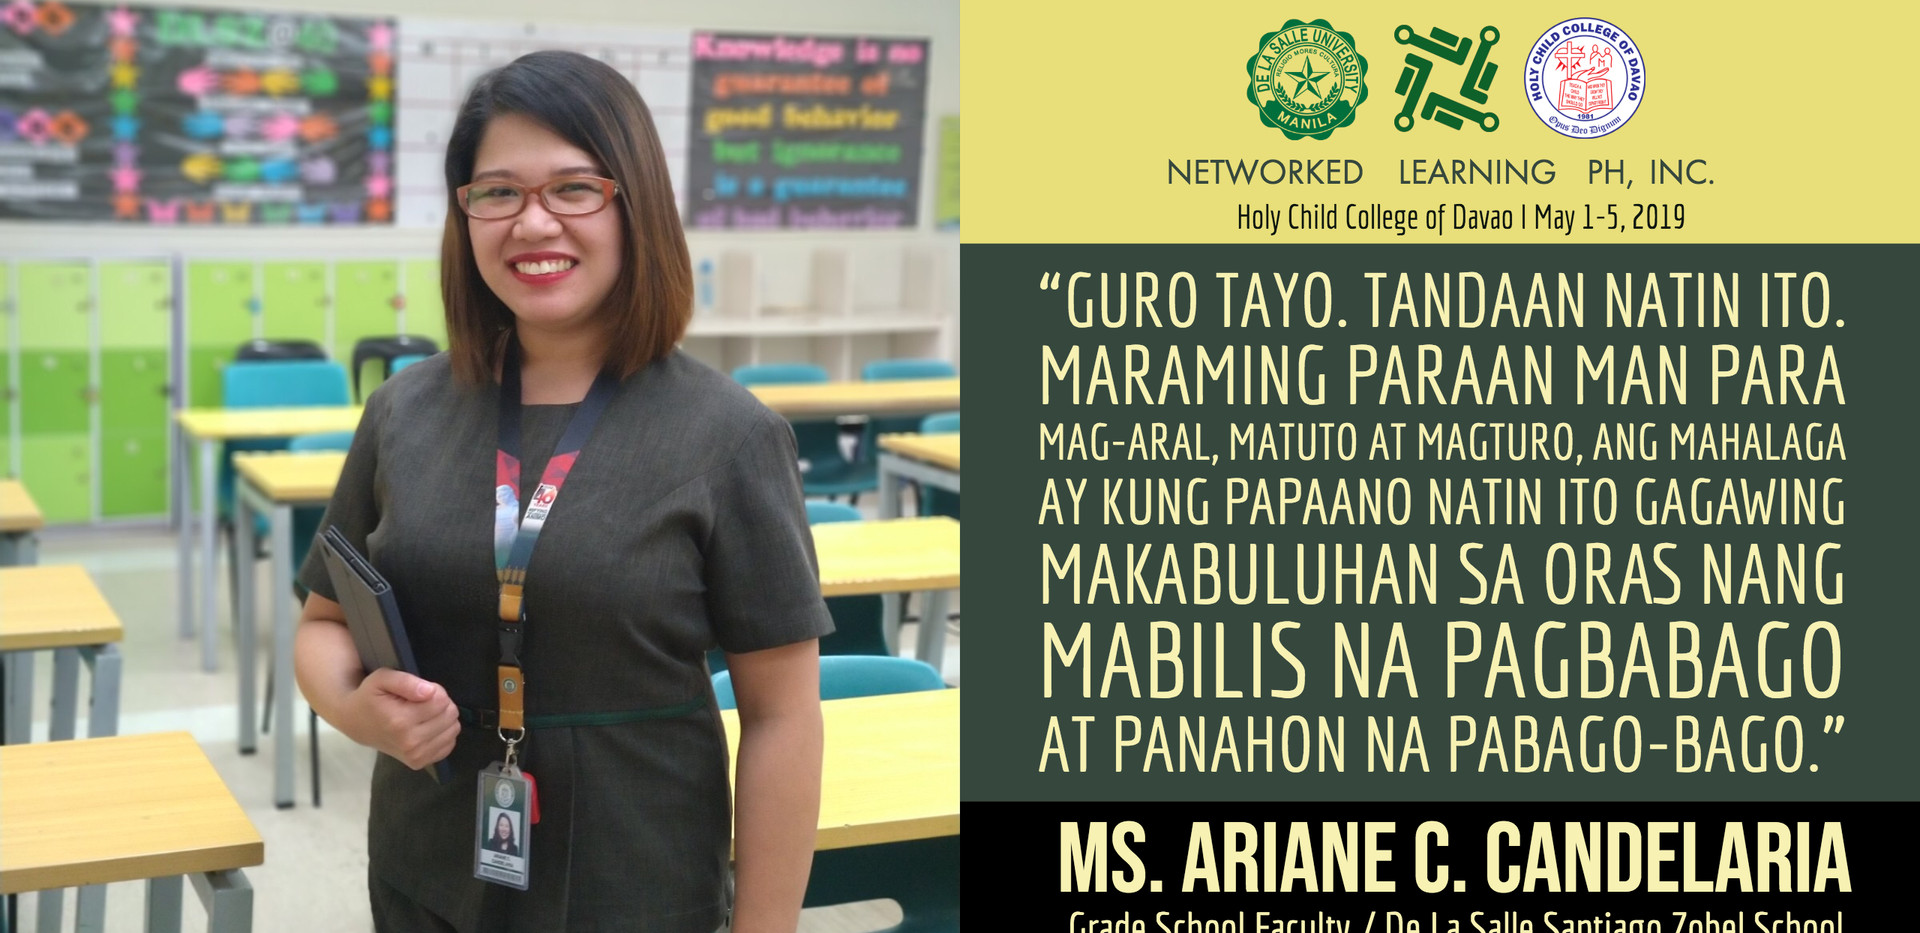 Ms. Arianne C. Candelaria